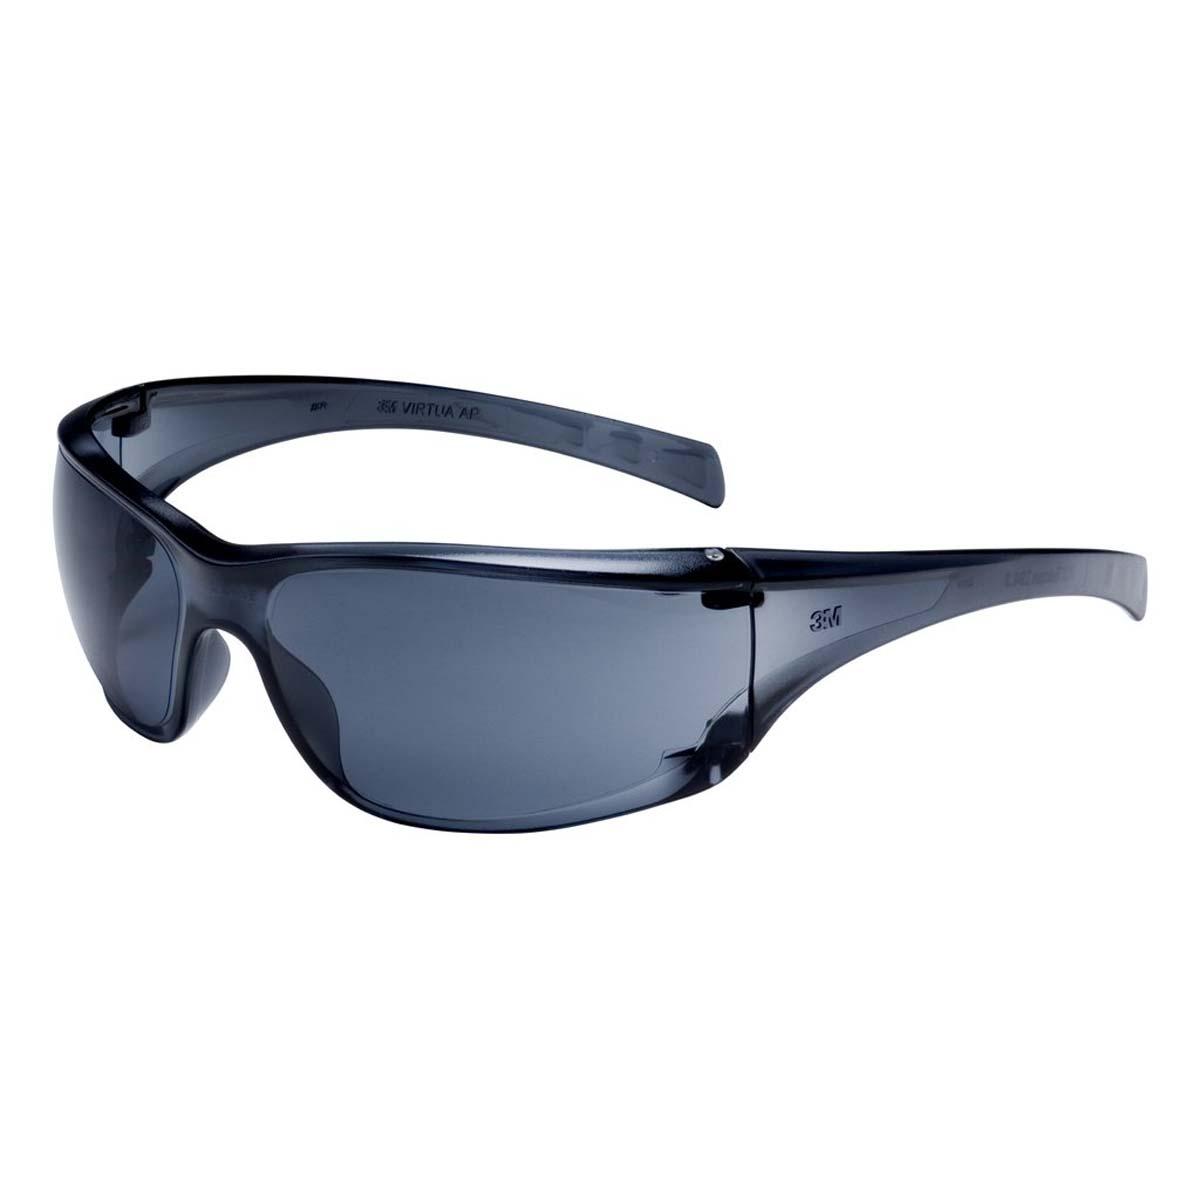 "3Mâ""¢ Virtuaâ""¢ AP Protective Eyewear 11815-00000-20 Gray Hard Coat Lens,"